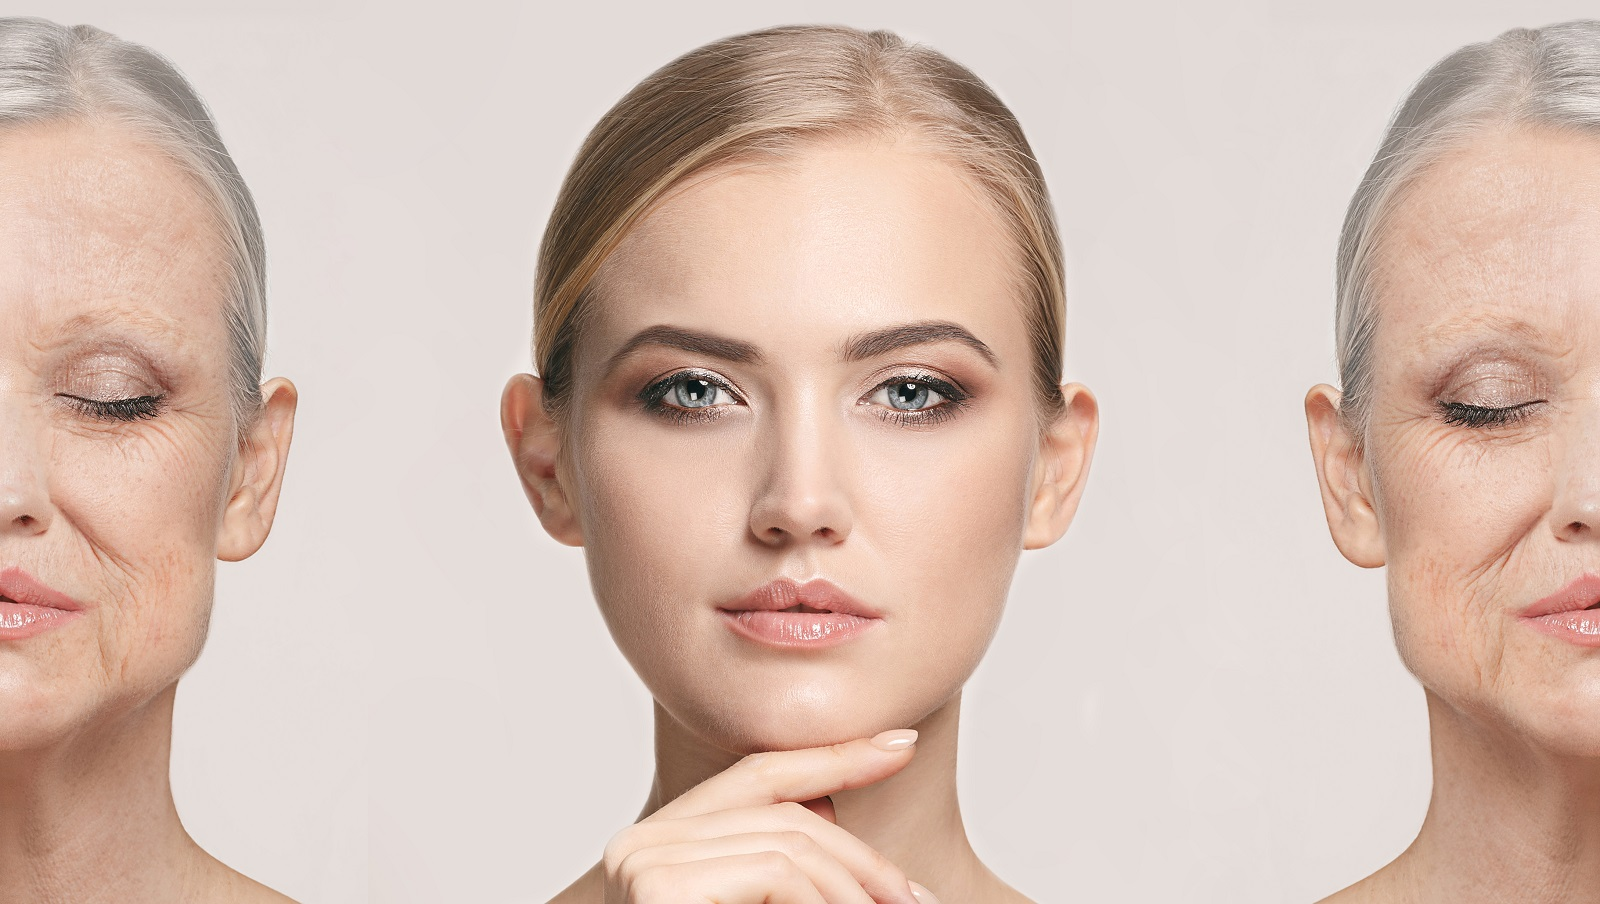 Comparison_Portrait_Of_Beautiful_Woman_With_Problem_And_Clean_Skin_Pilares_de_Saude_Impact_Transition